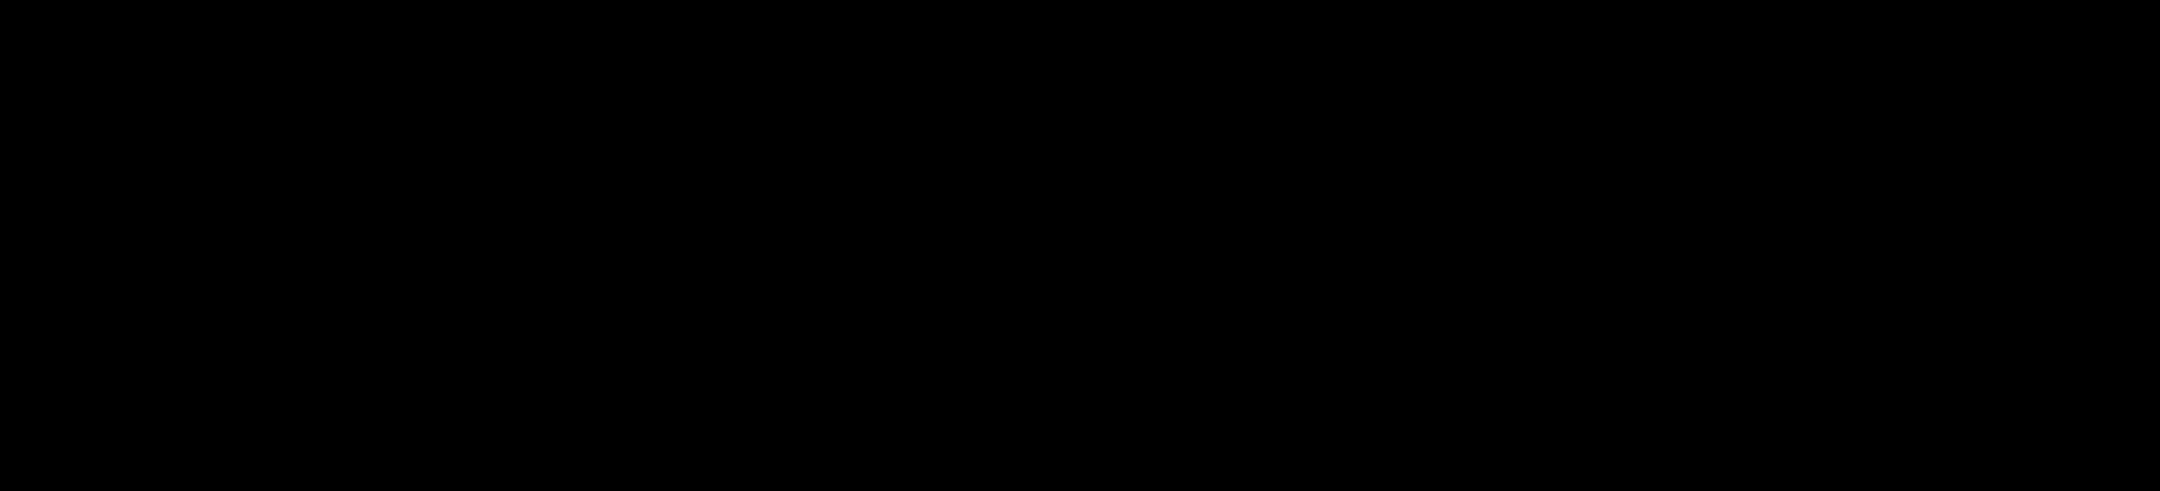 hurley logo 1 - Hurley Logo